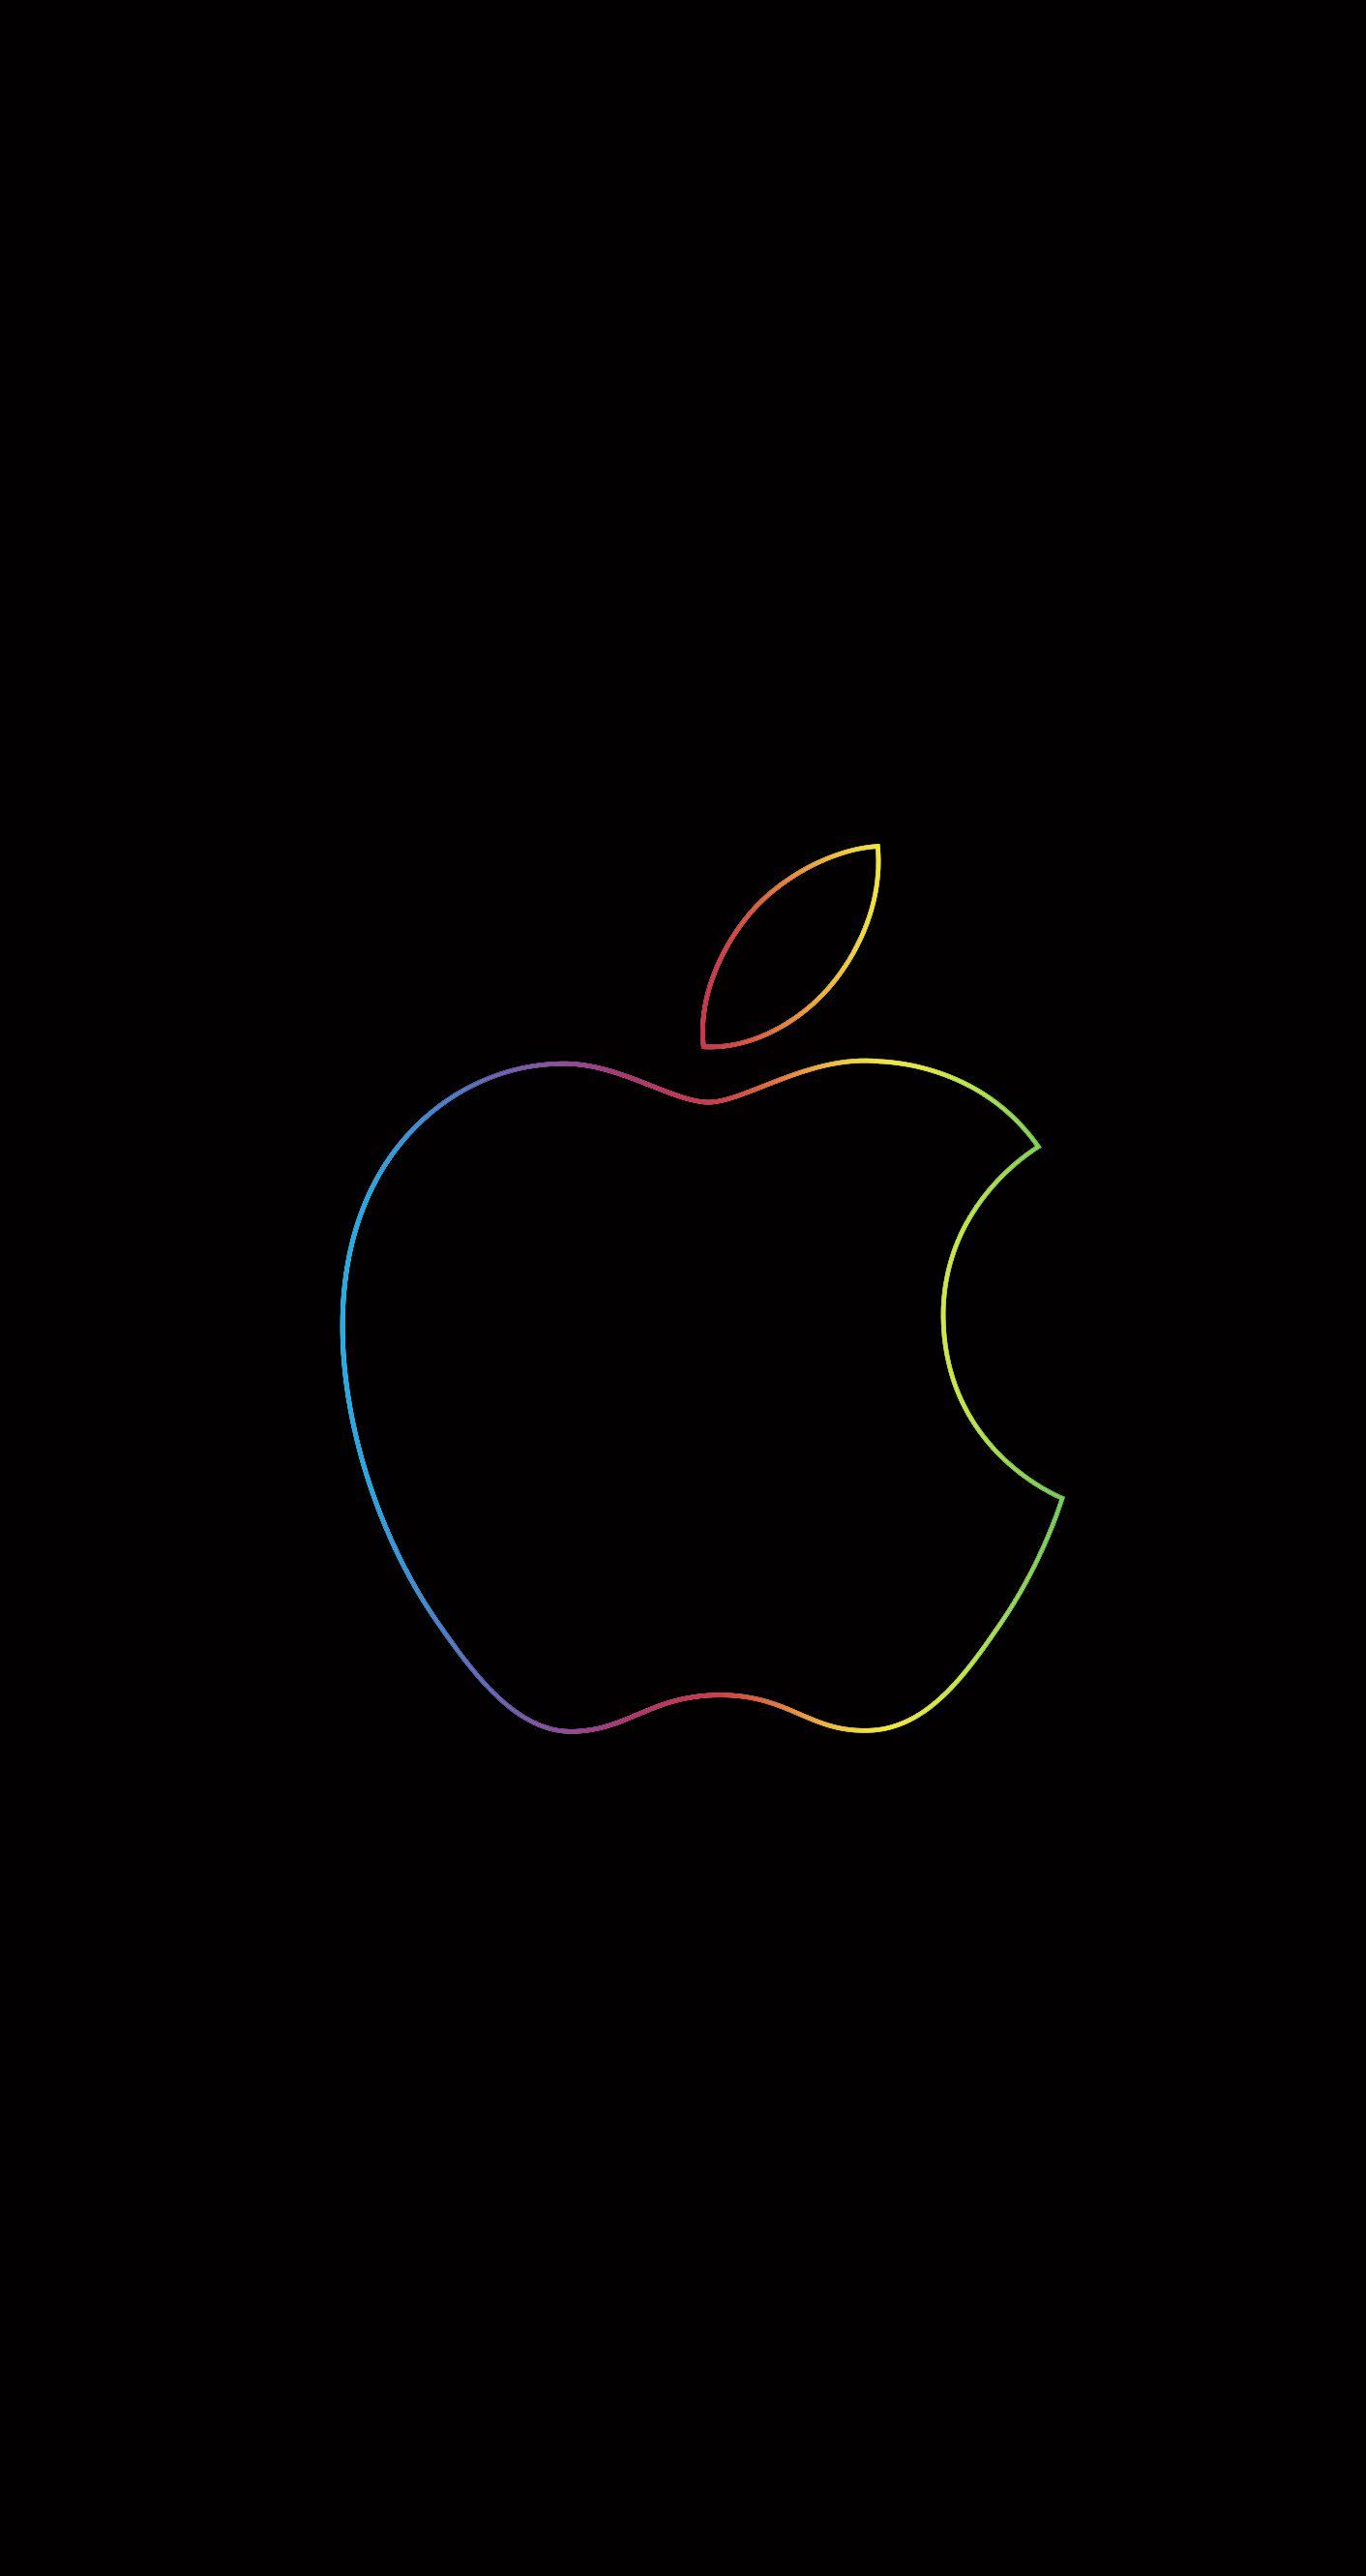 Apple Logo Vector アップルの壁紙 Apple ロゴ Iphone 用壁紙